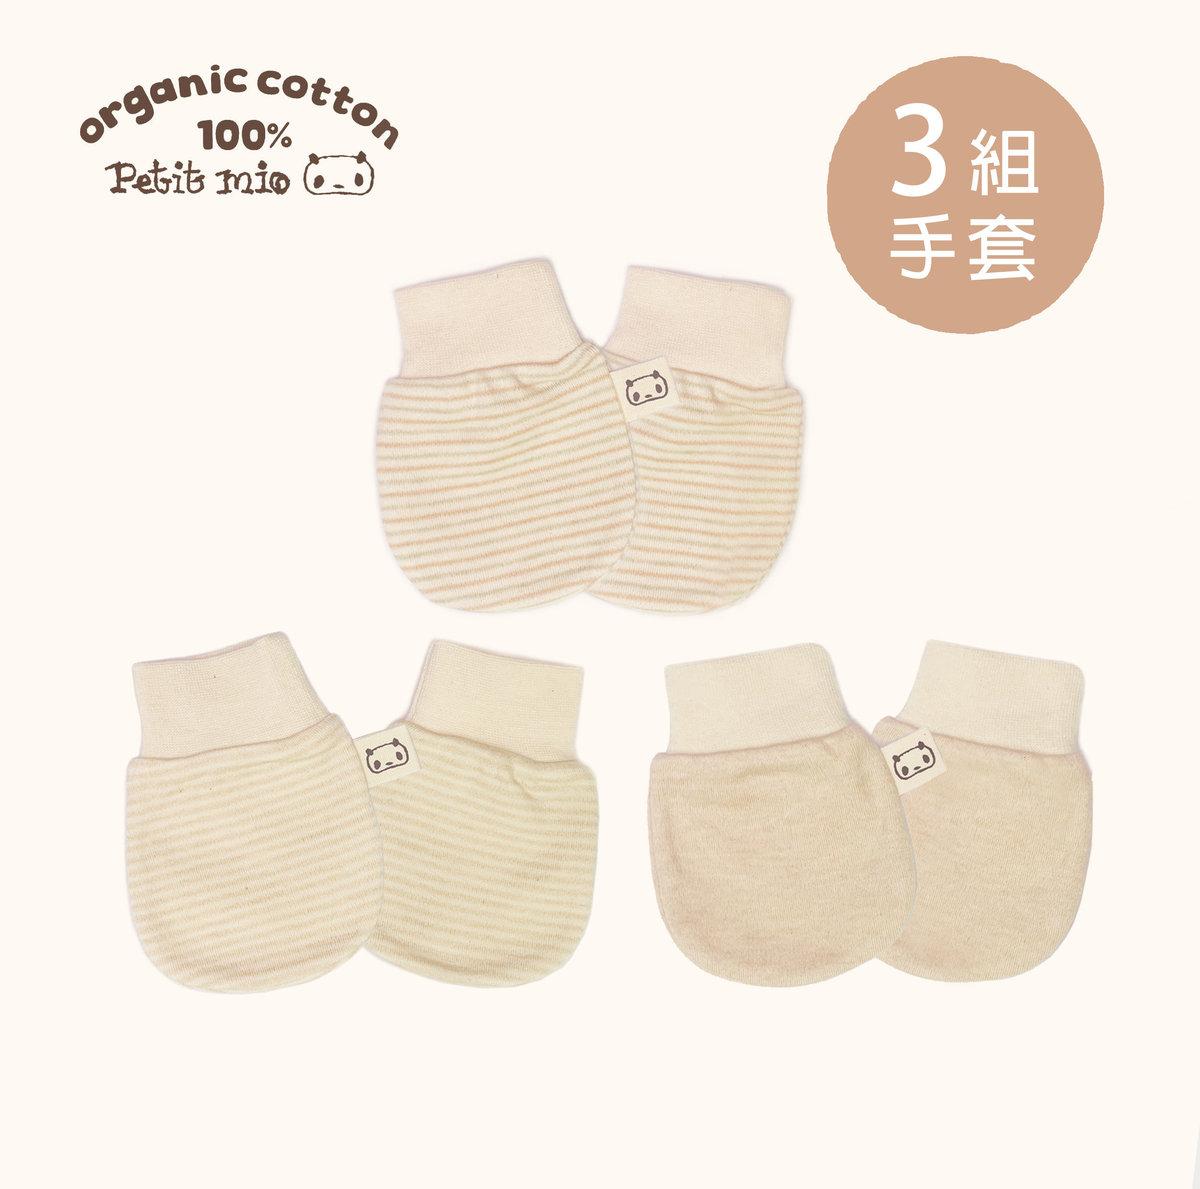 Organic Cotton Baby Mittens/Anti Scratch Baby Gloves, 3 Pairs